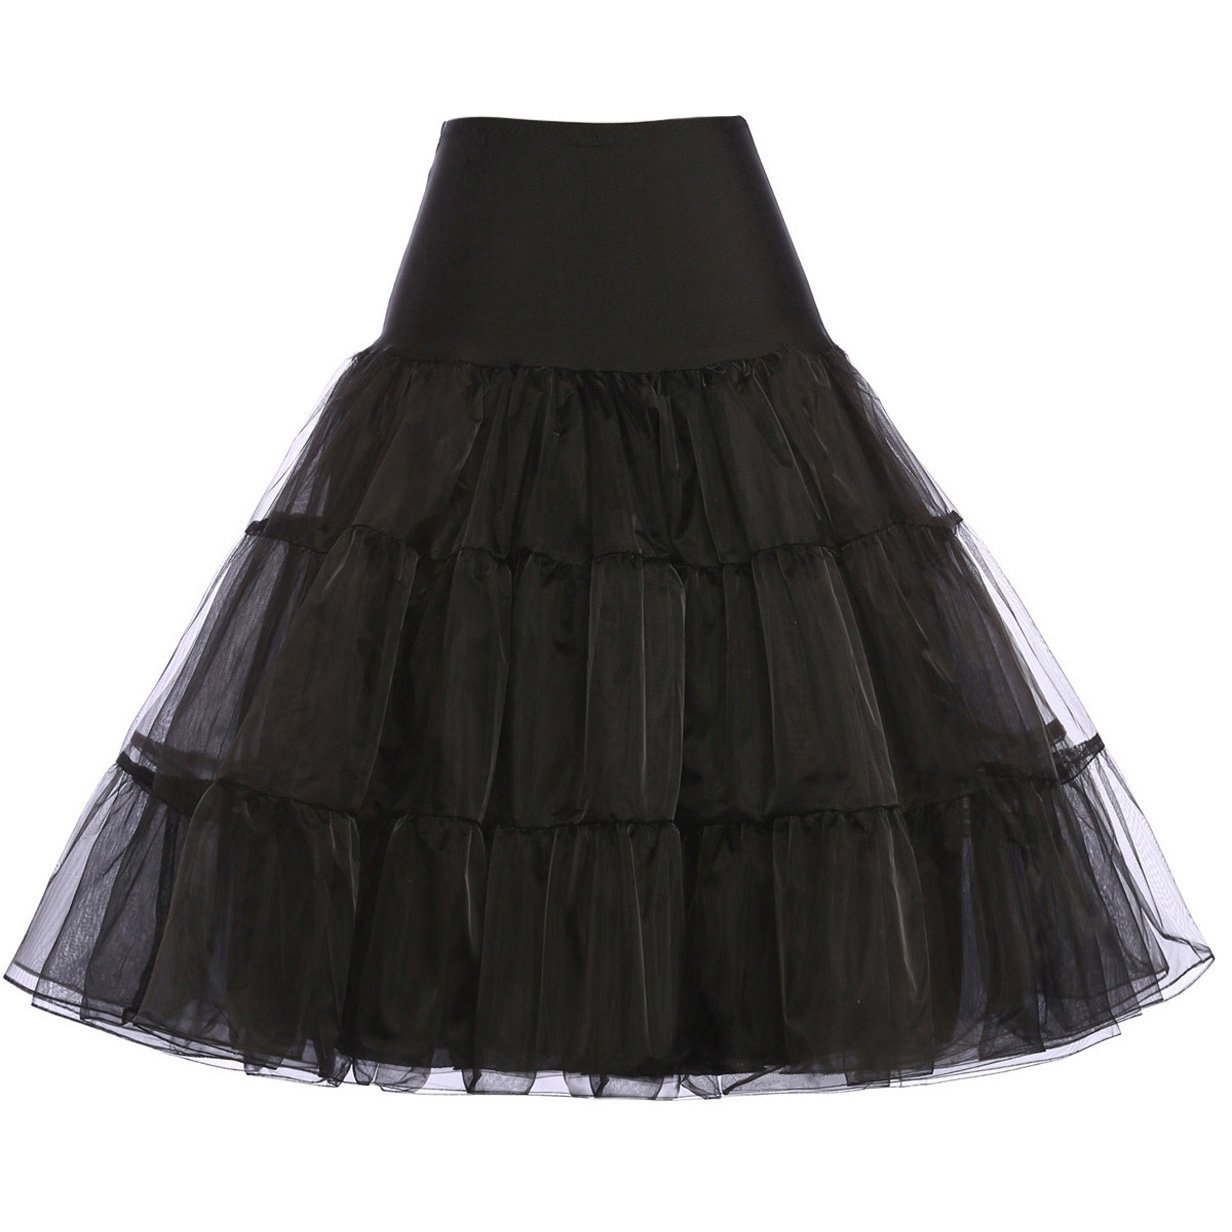 GRACE KARIN®Women 50s Petticoat Skirts Tutu Crinoline Underskirt CL8922 0